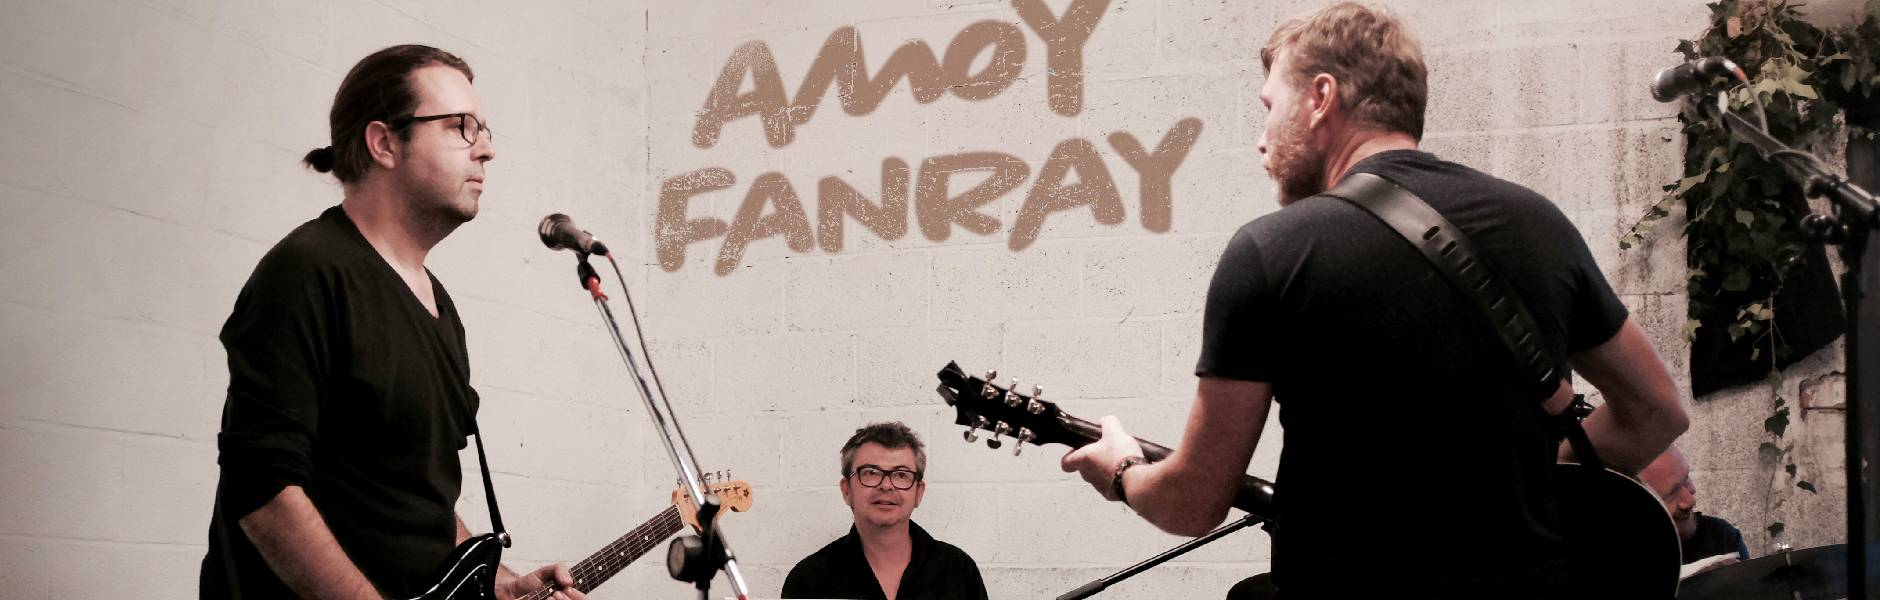 Amoy Fanray